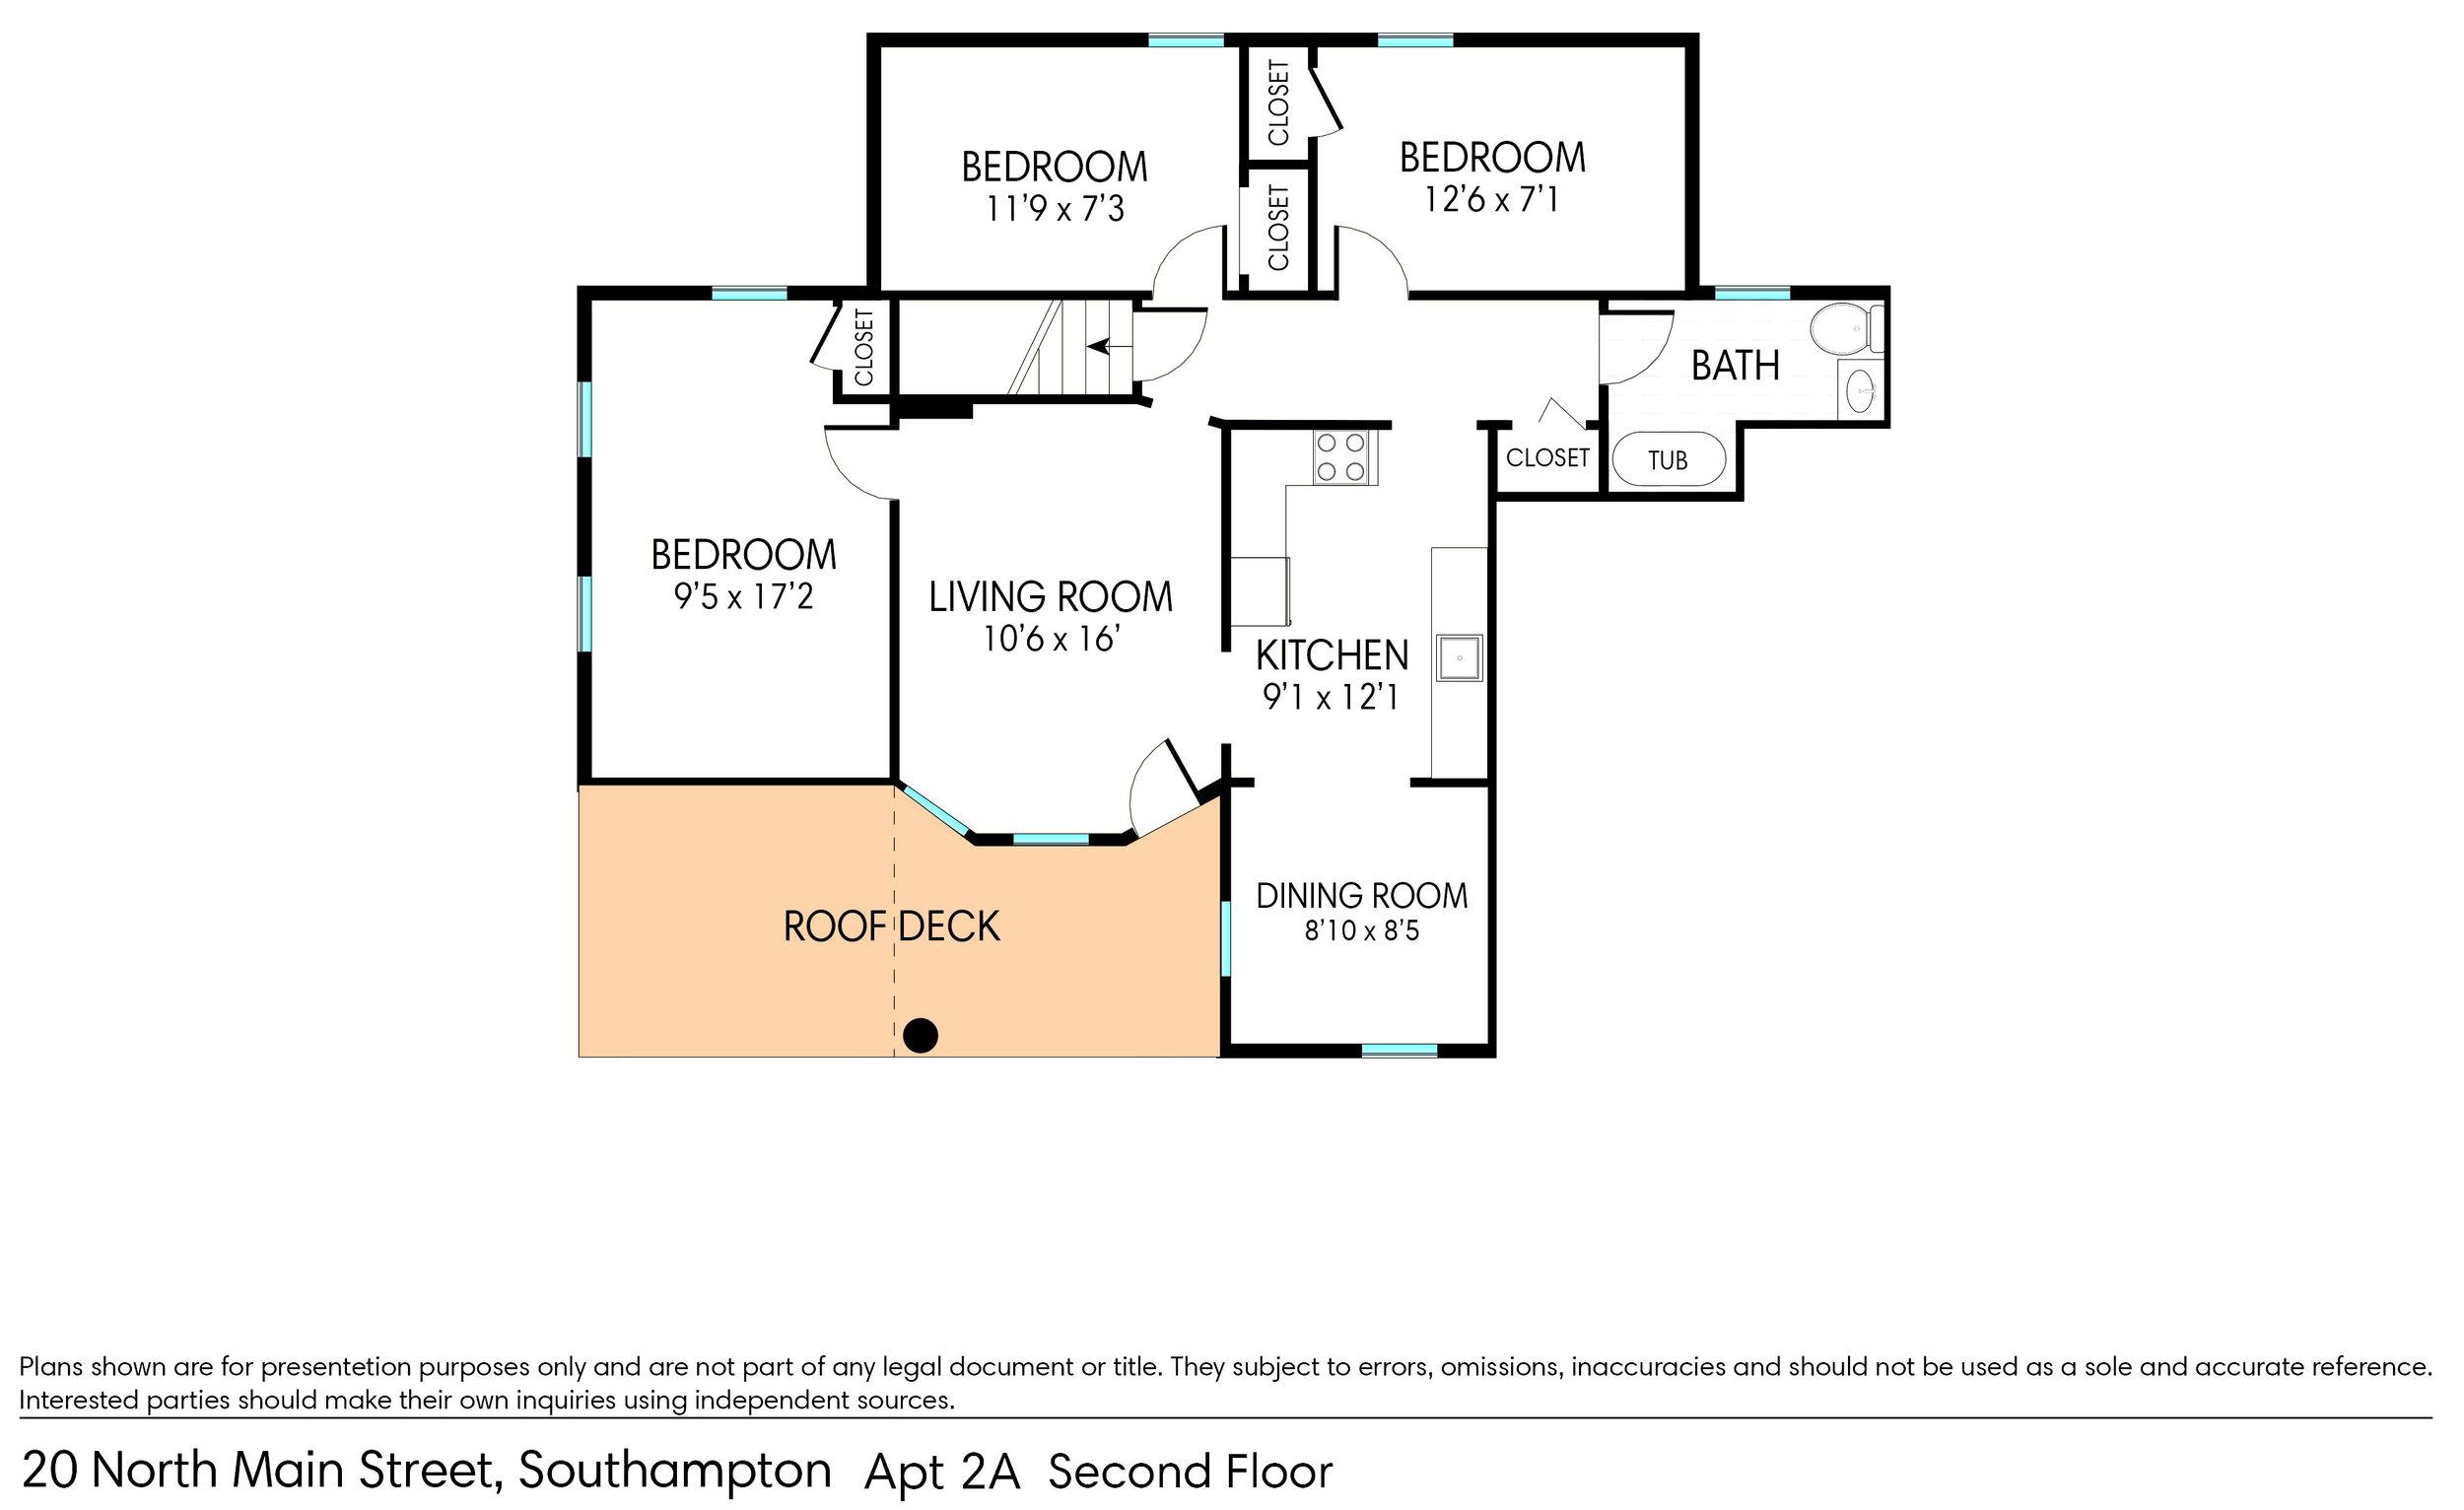 20_NORTH_MAIN_STREET_SOUTHAMPTON_2A_FLOOR-2.jpg